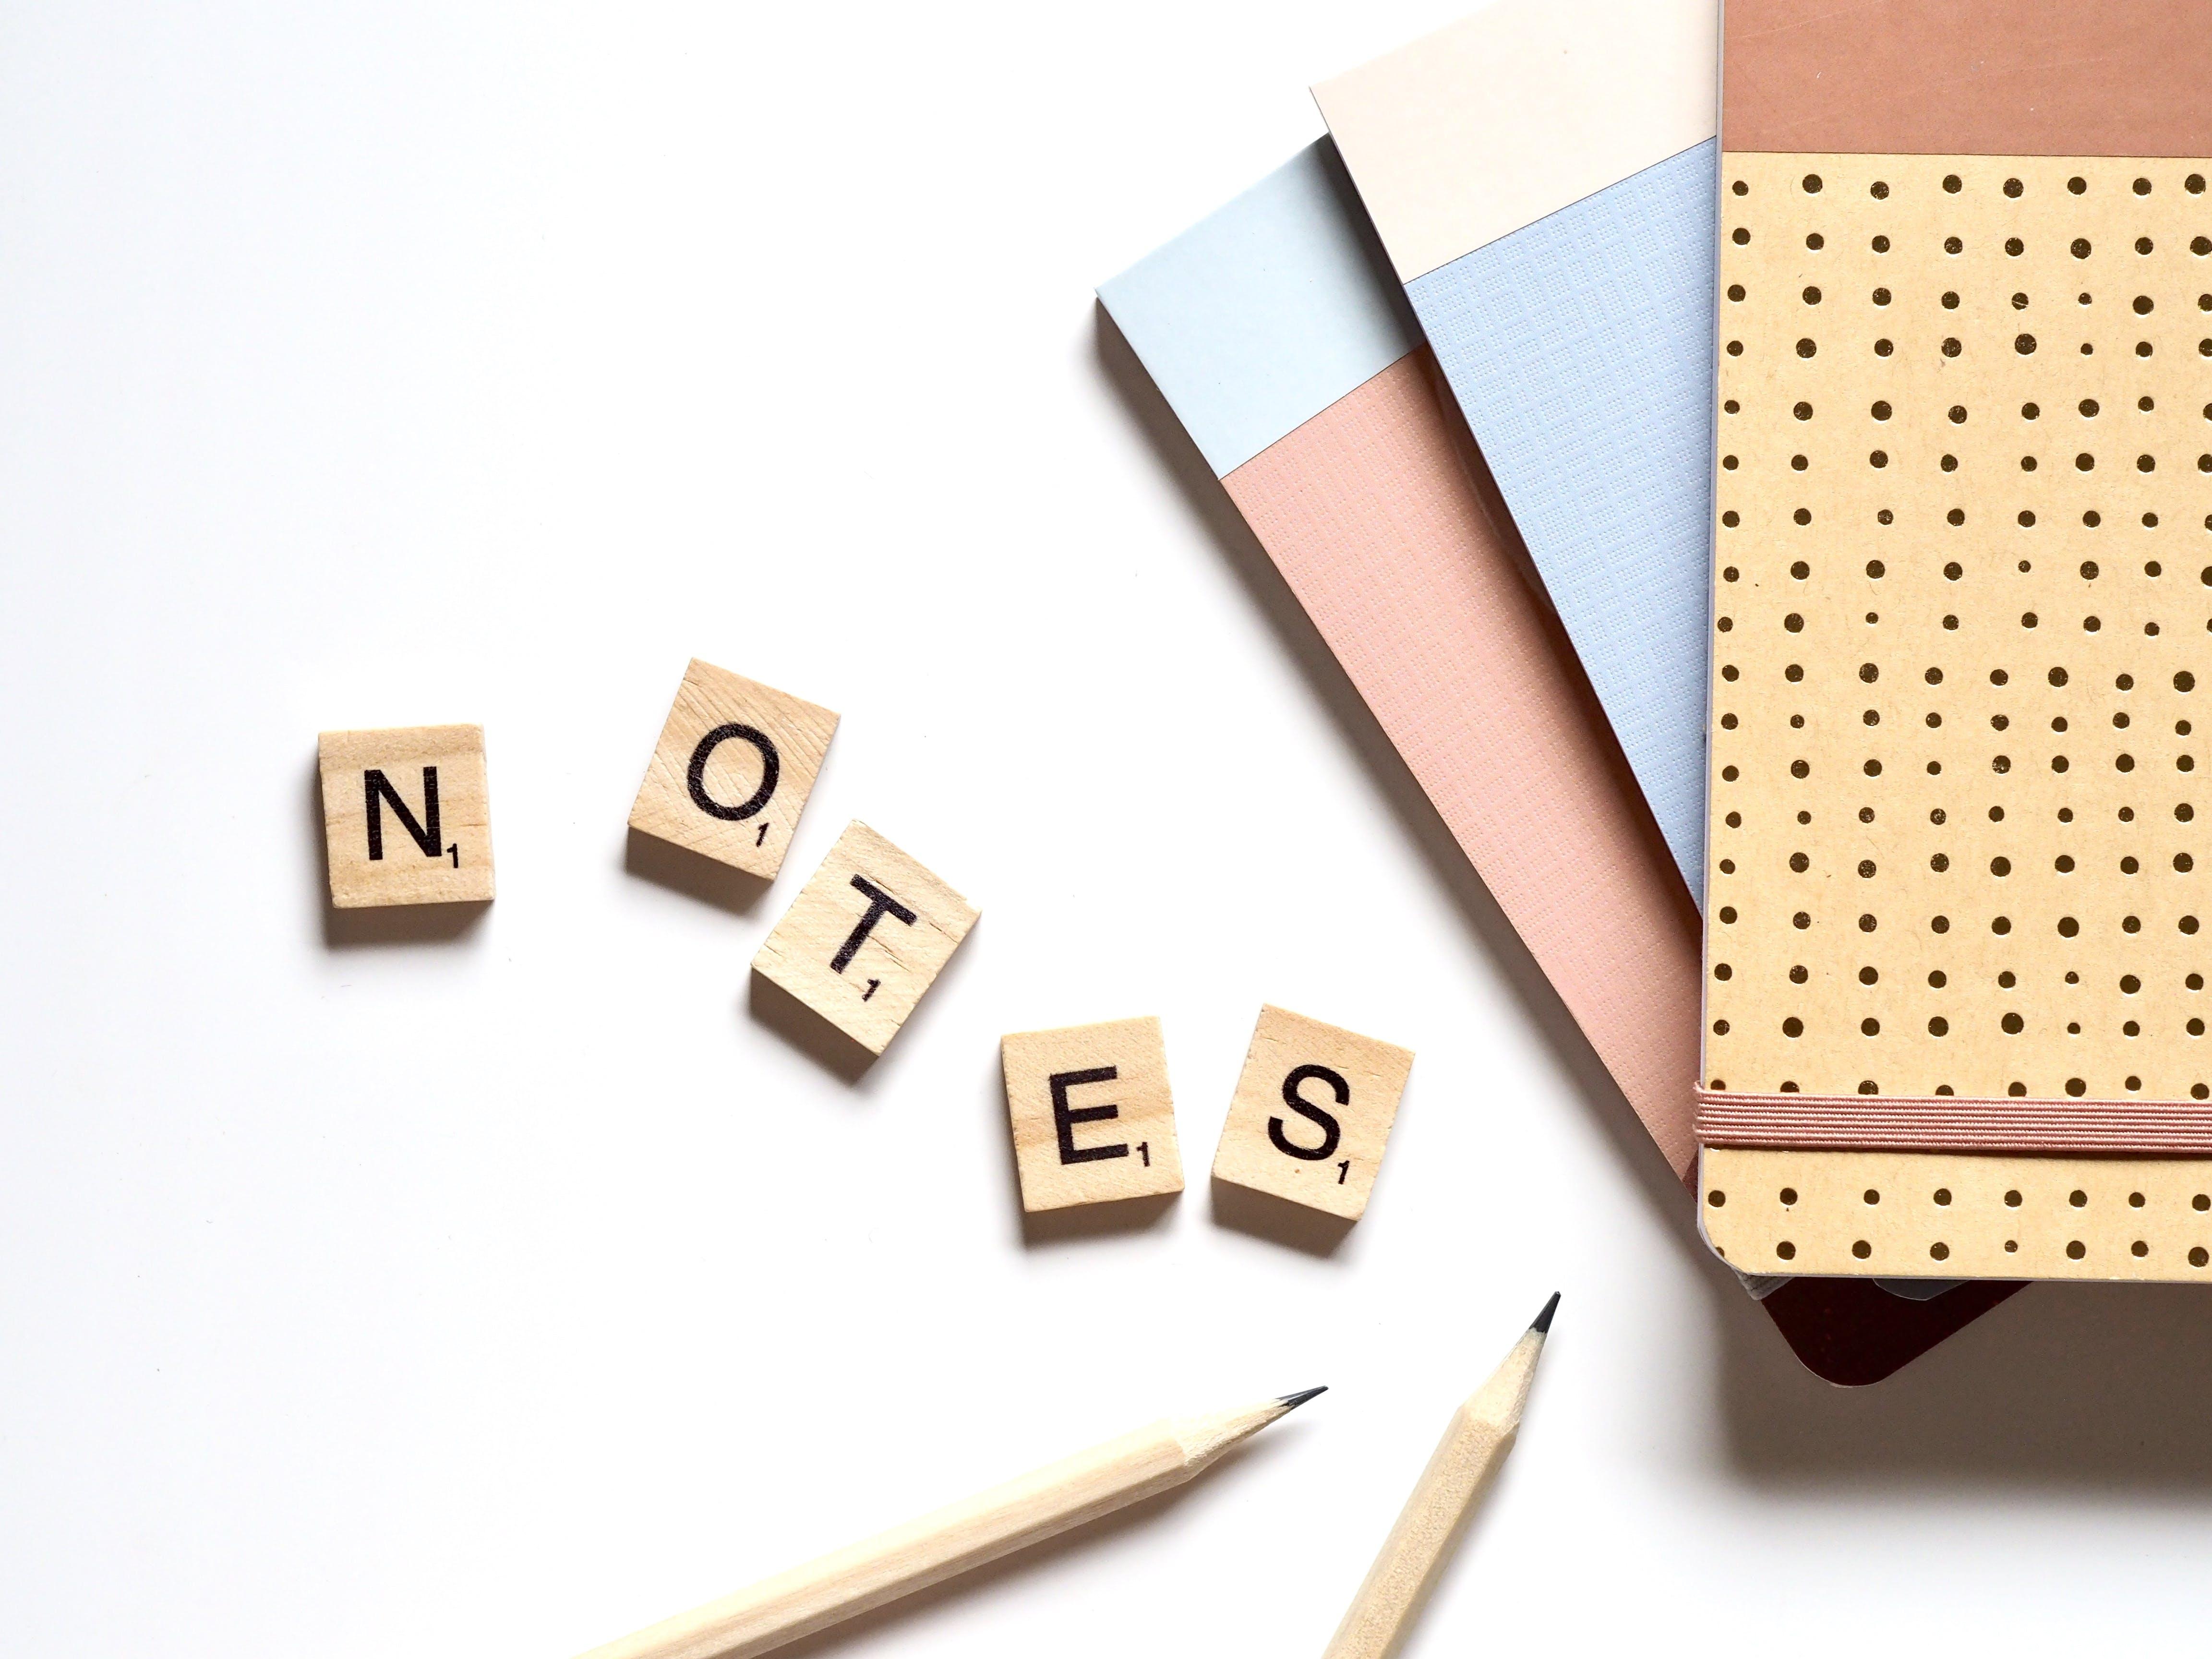 Five Brown Wooden Scrabble Tiles Beside Two Pencils